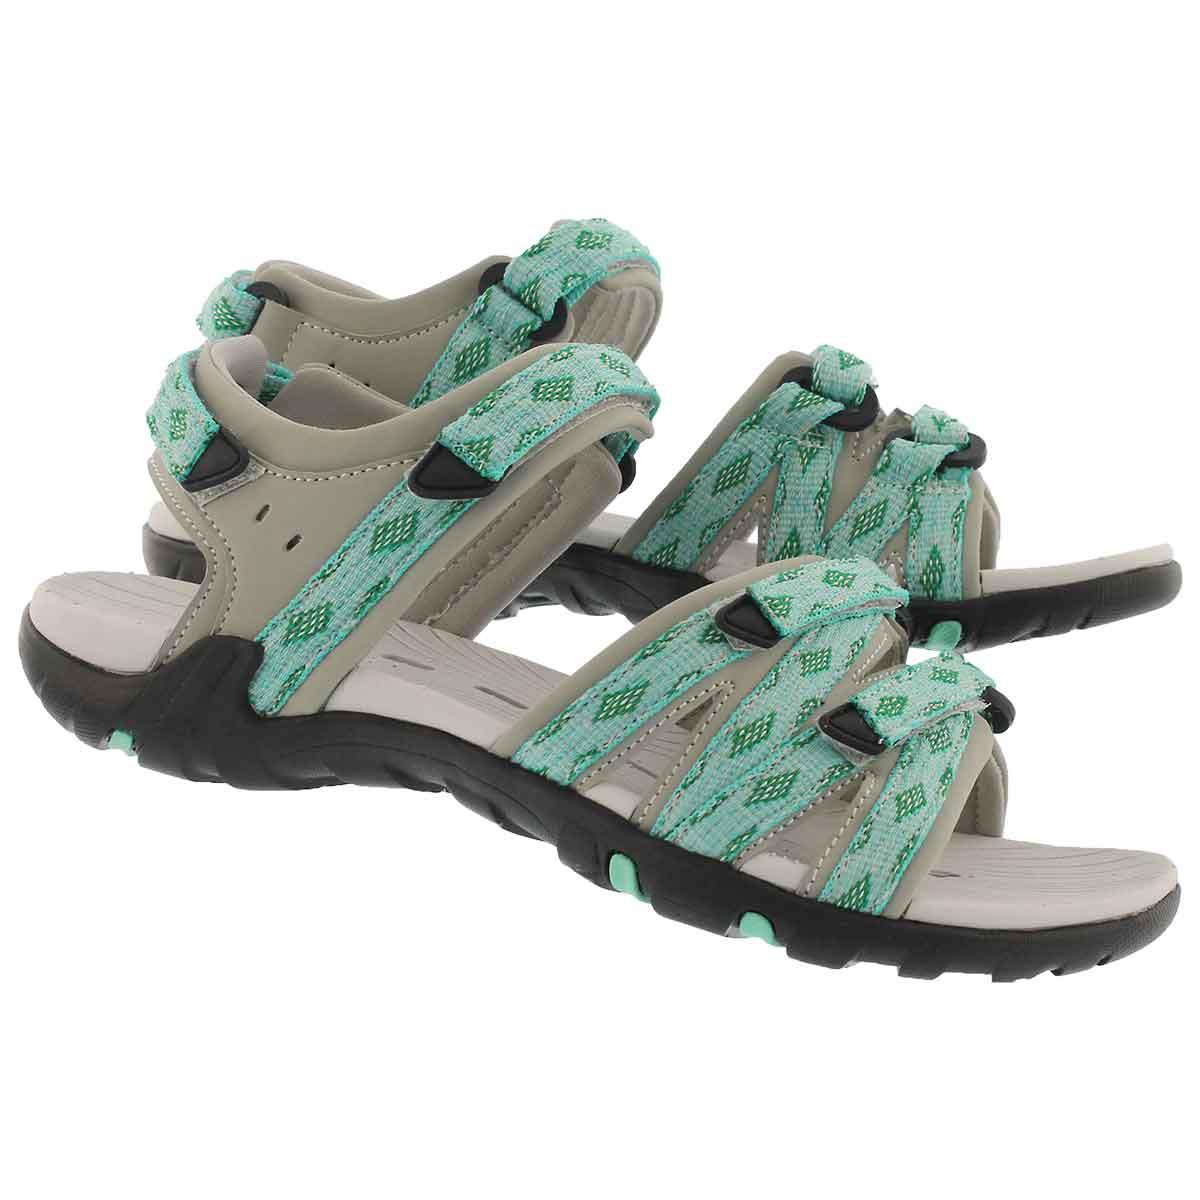 Lds Khaleesi turquoise sport sandal